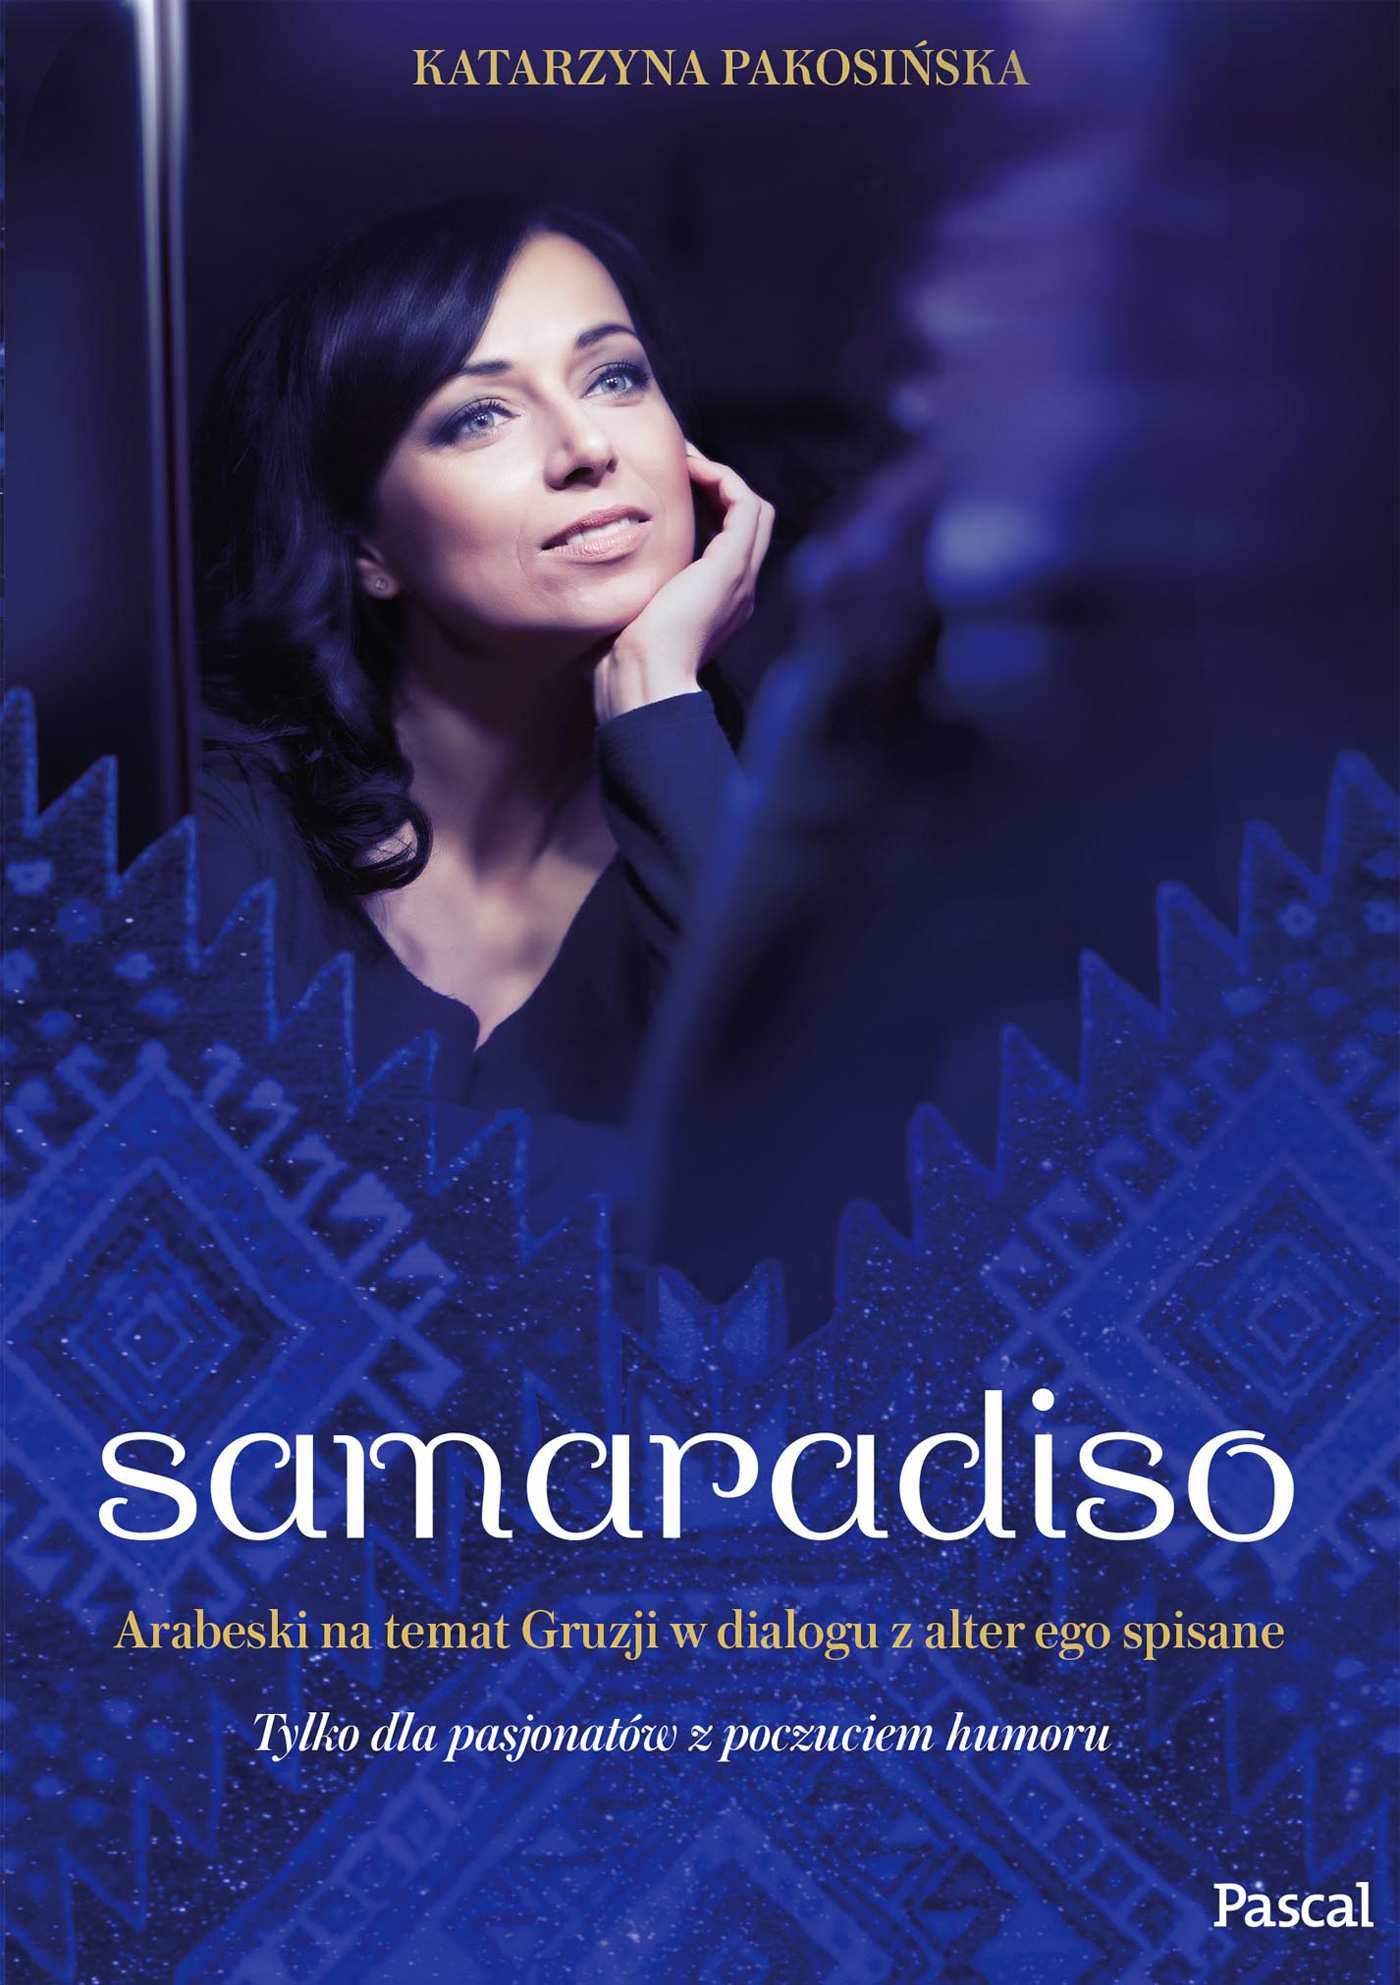 Samaradiso - Ebook (Książka na Kindle) do pobrania w formacie MOBI